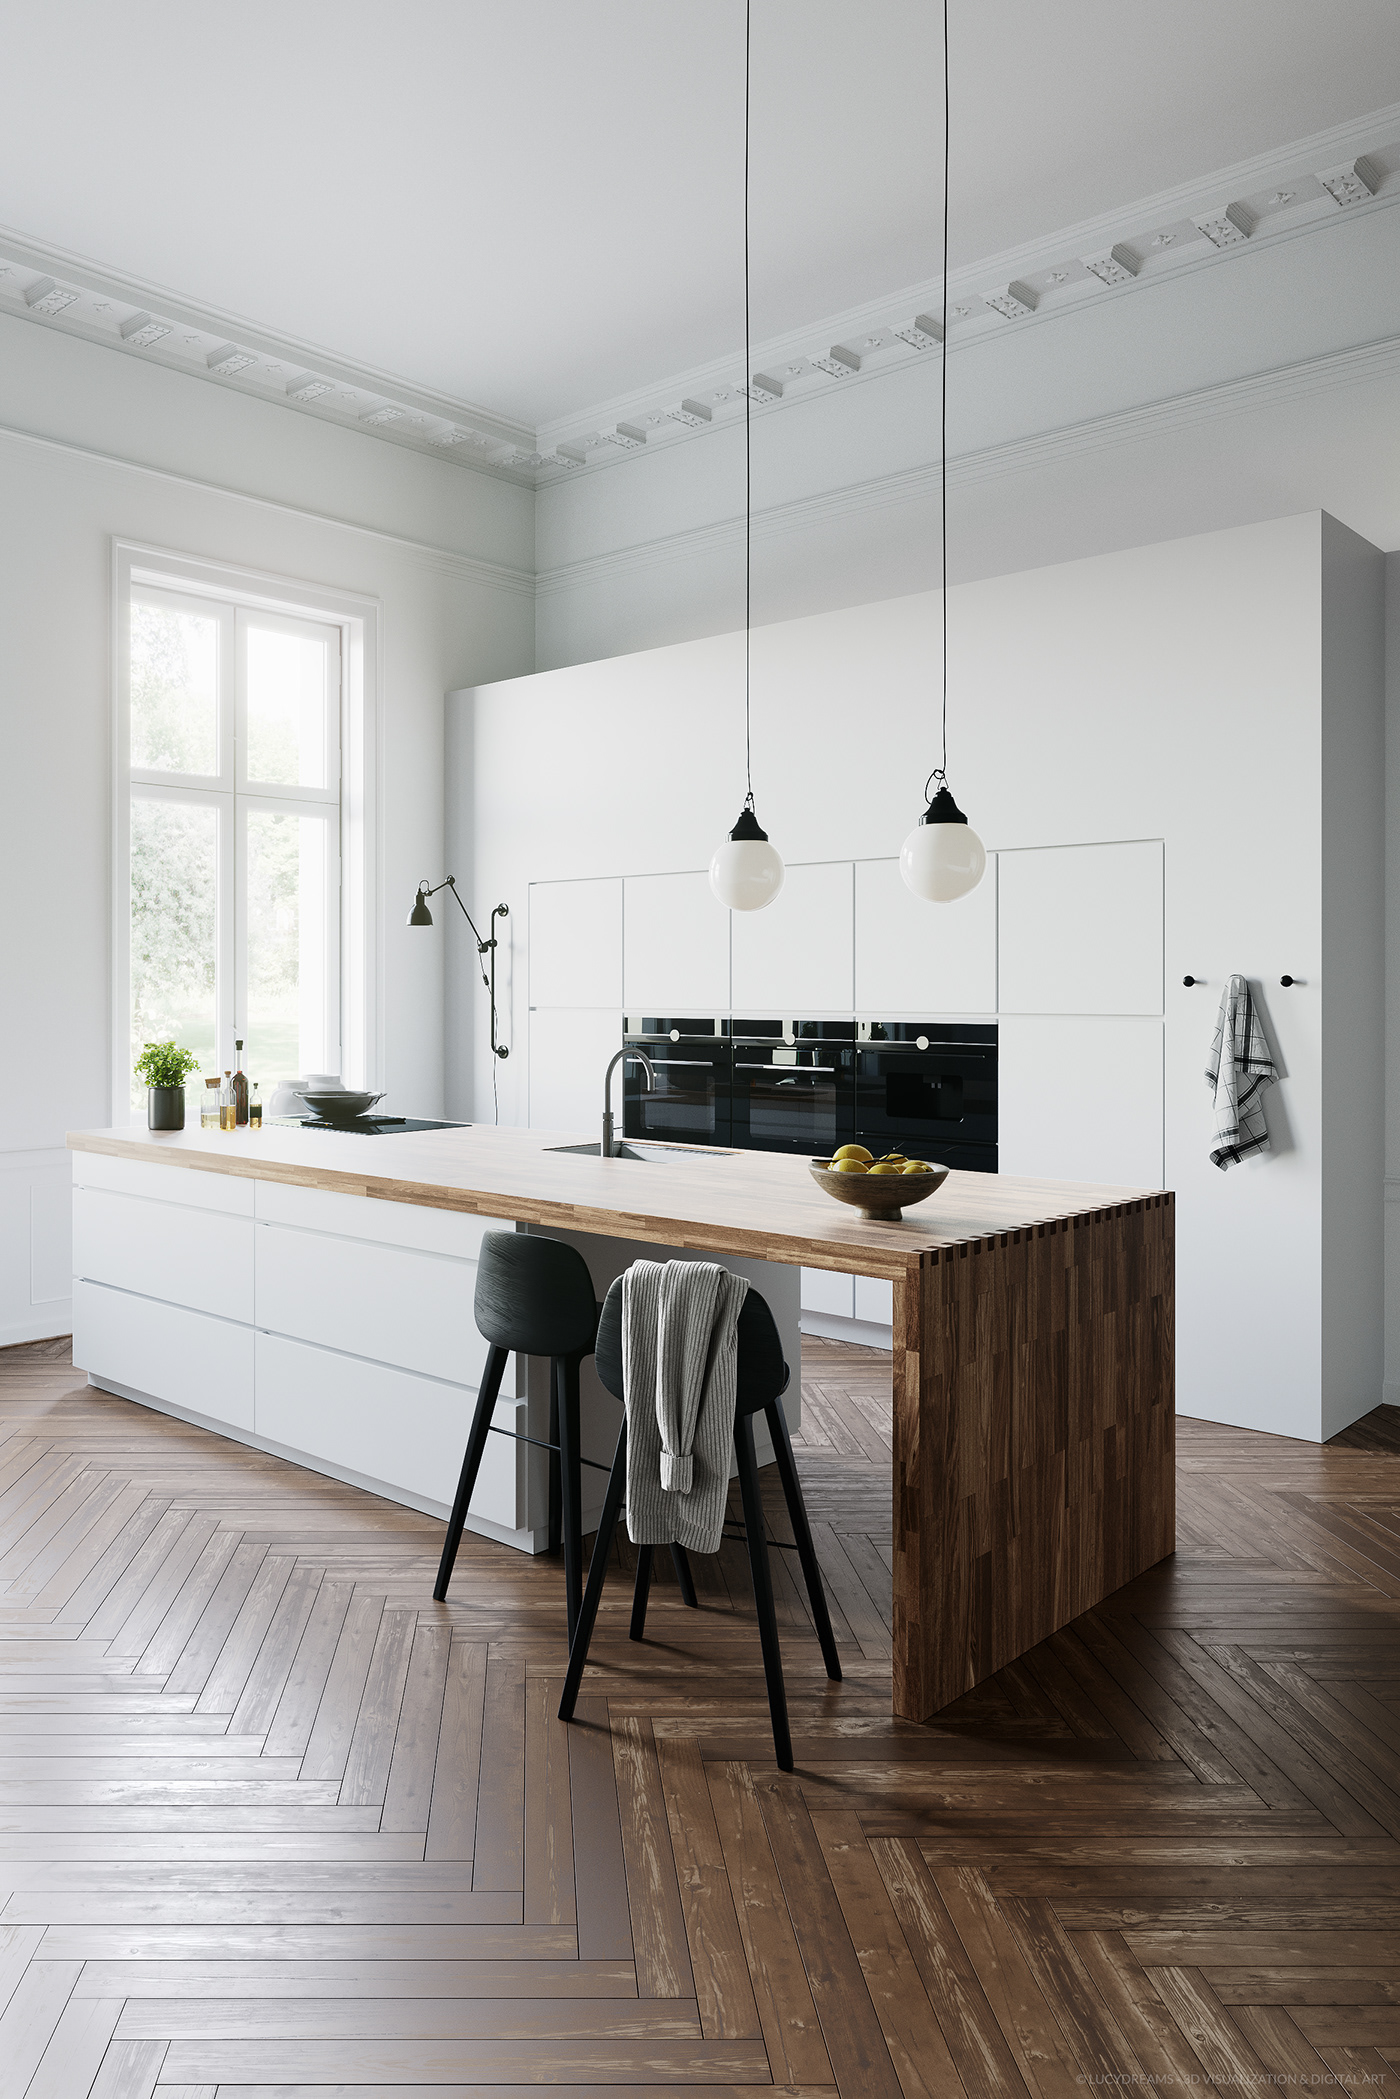 kitchen cinema4d coronarenderer rendering 3D archviz 3dscene interiordesign design Interior